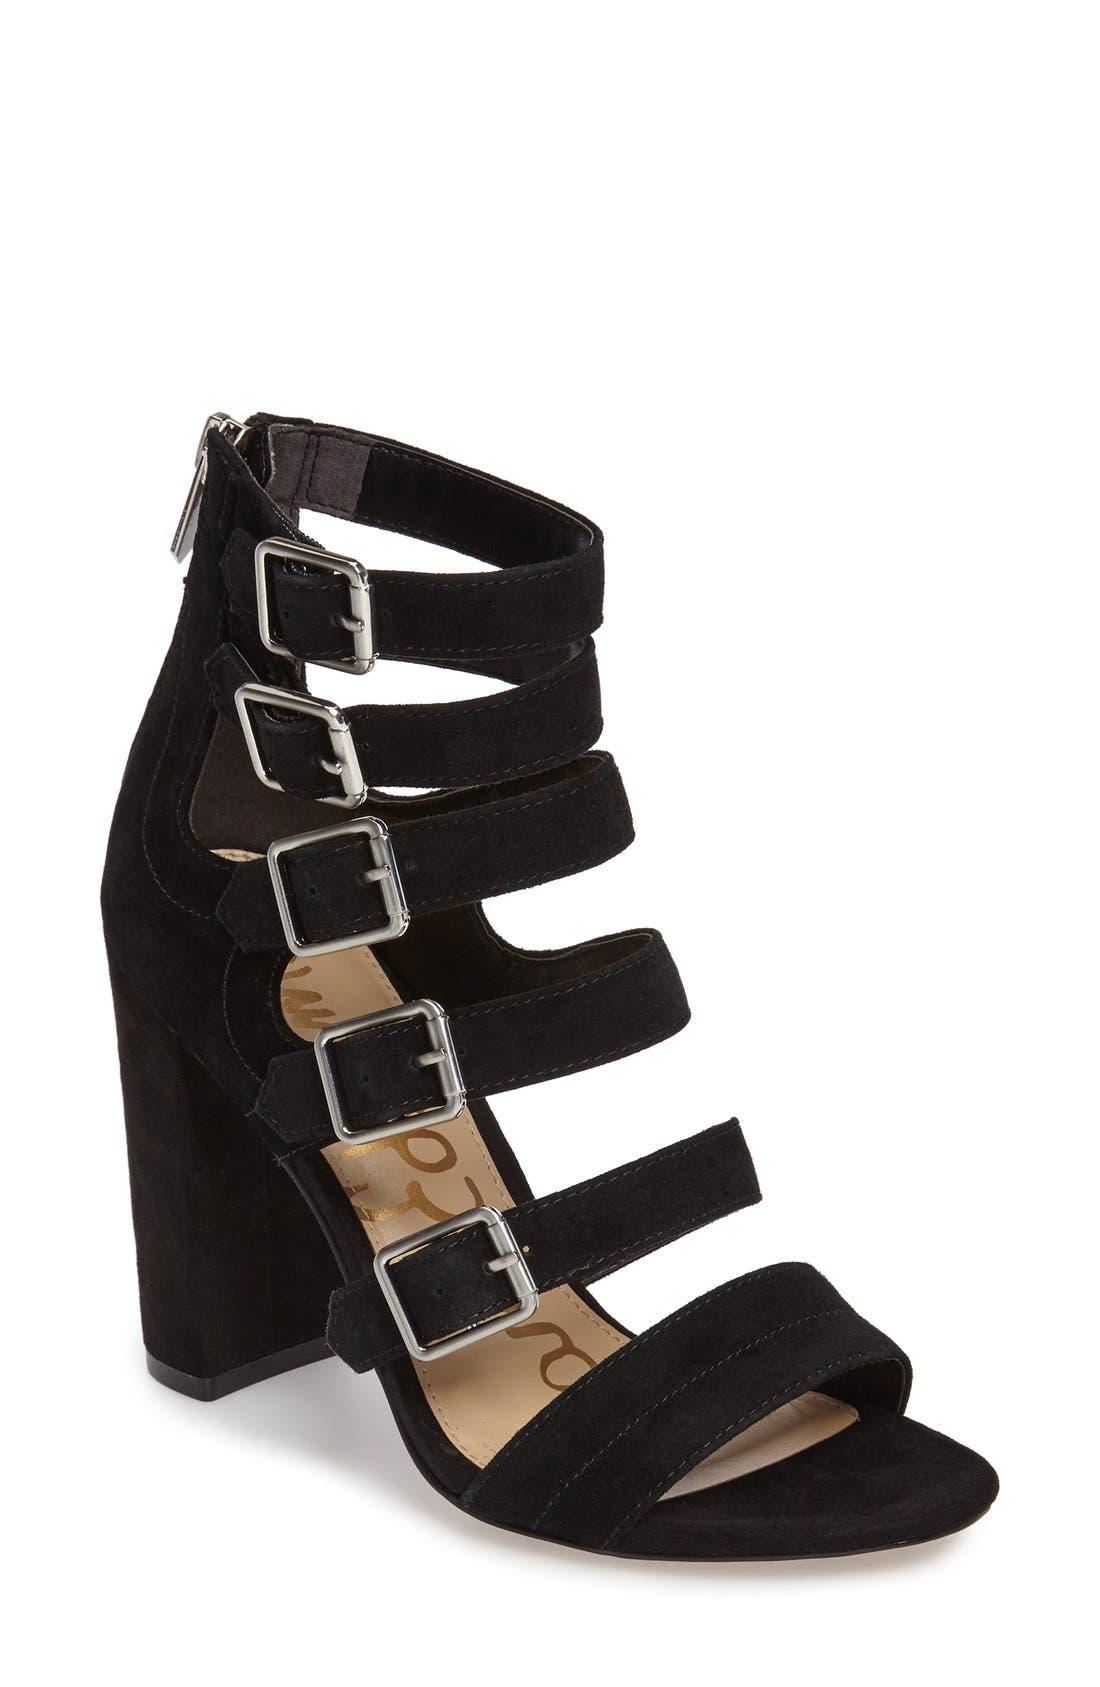 Alternate Image 1 Selected - Sam Edelman Yasmina Buckle Strap Gladiator Sandal (Women)